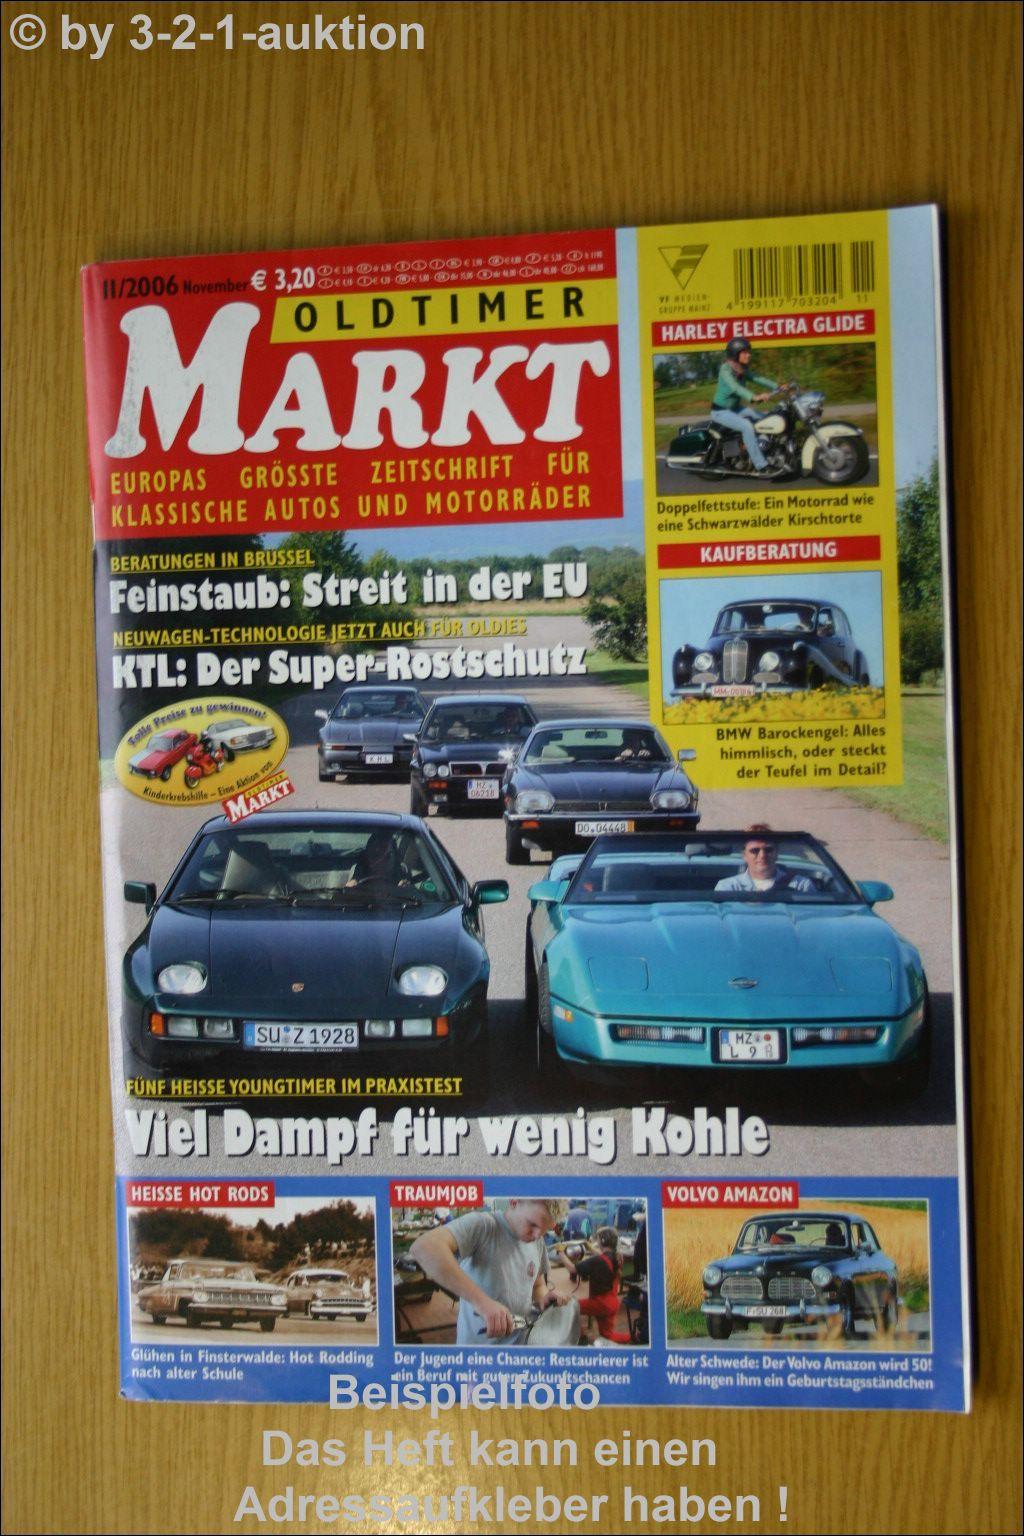 oldtimer markt 11 06 volvo amazon corvette porsche 928 ebay. Black Bedroom Furniture Sets. Home Design Ideas